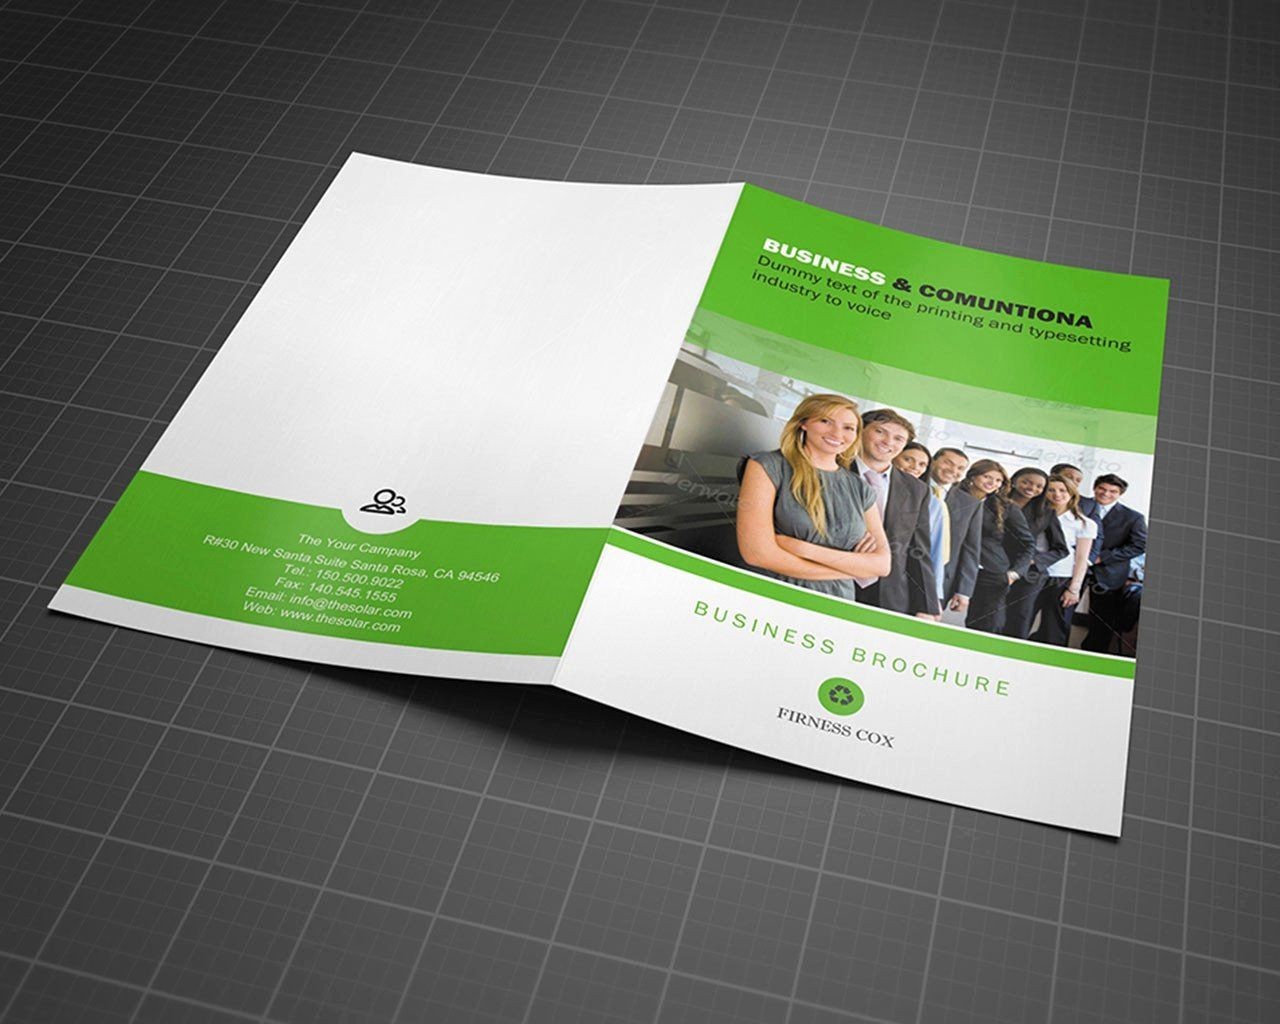 Half Fold Brochure Template Free Lovely 50 Best Free Half Fold Brochure Template Microsoft Word Free Brochure Template Brochure Template Business Brochure Free half fold brochure template